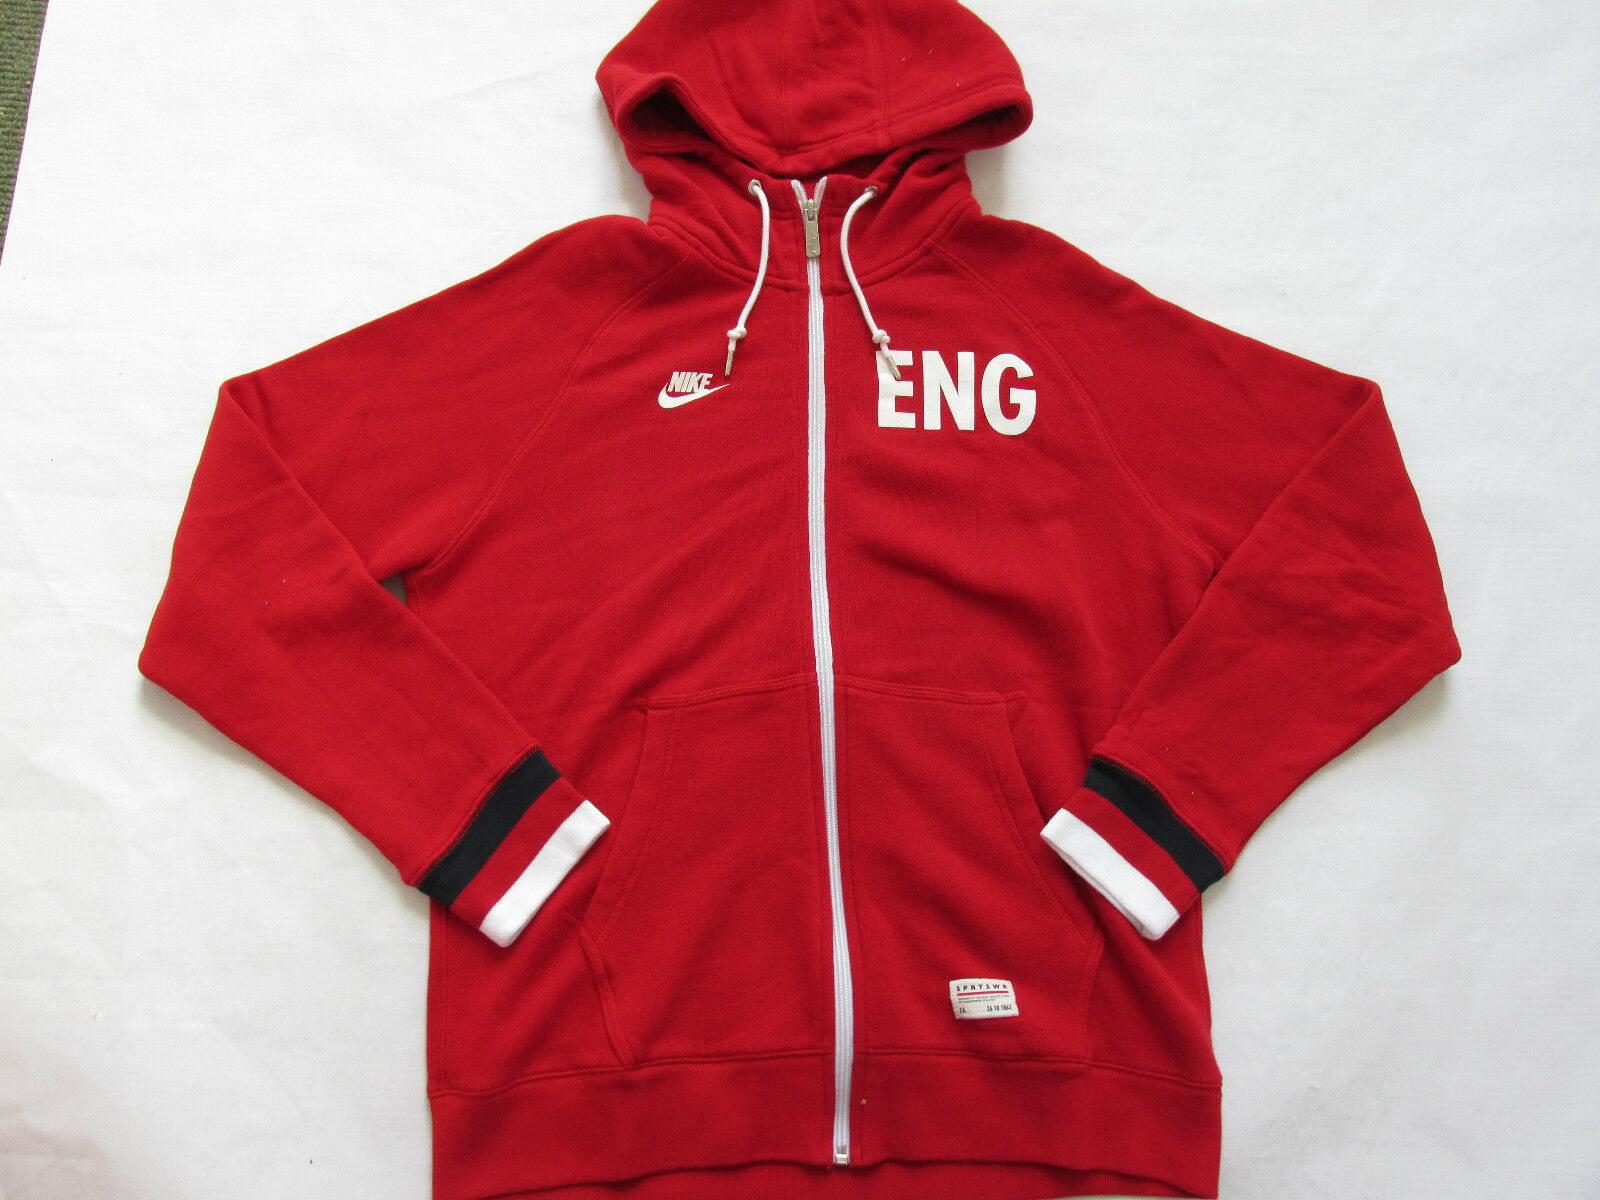 Nike sportswear england football hoodie sweatshirt 597344 604